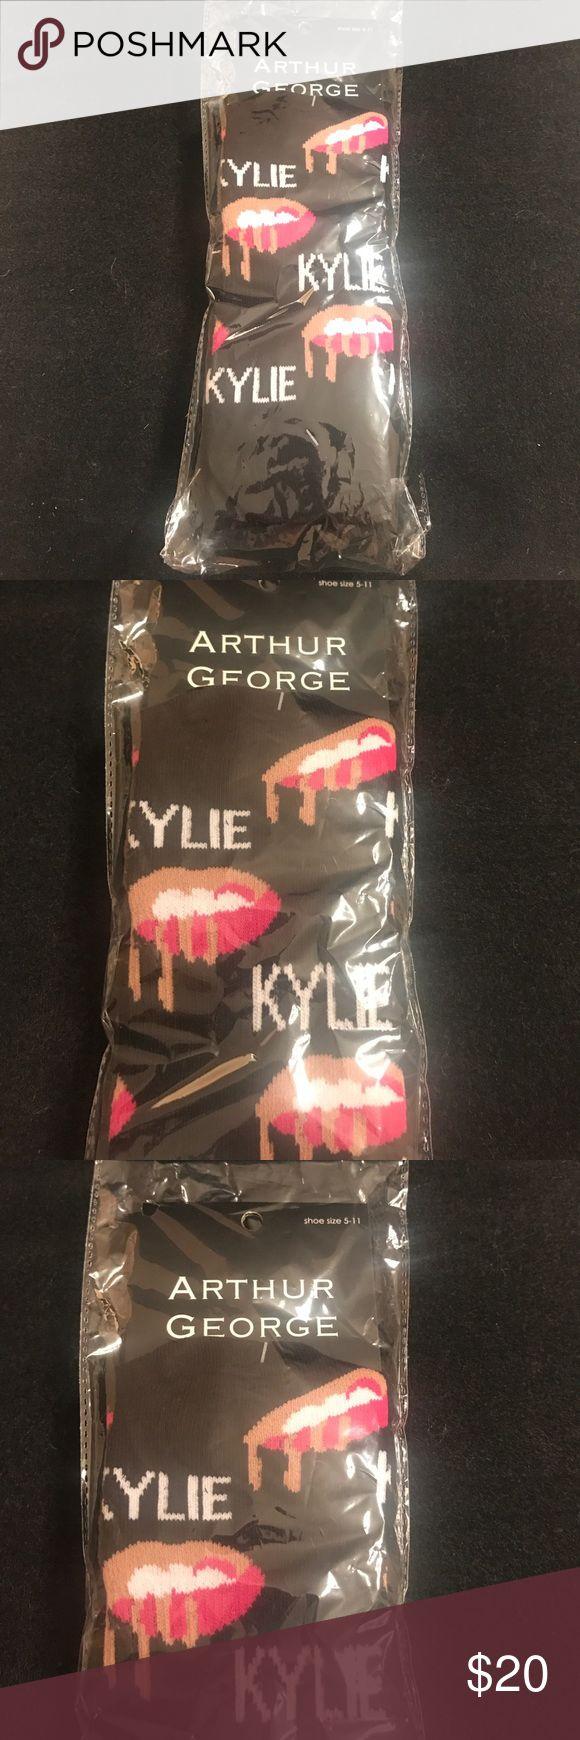 NWT Kylie Jenner Arthur George socks Black Kylie signature logo. Shoe size: 5-11 kylie jenner Accessories Hosiery & Socks